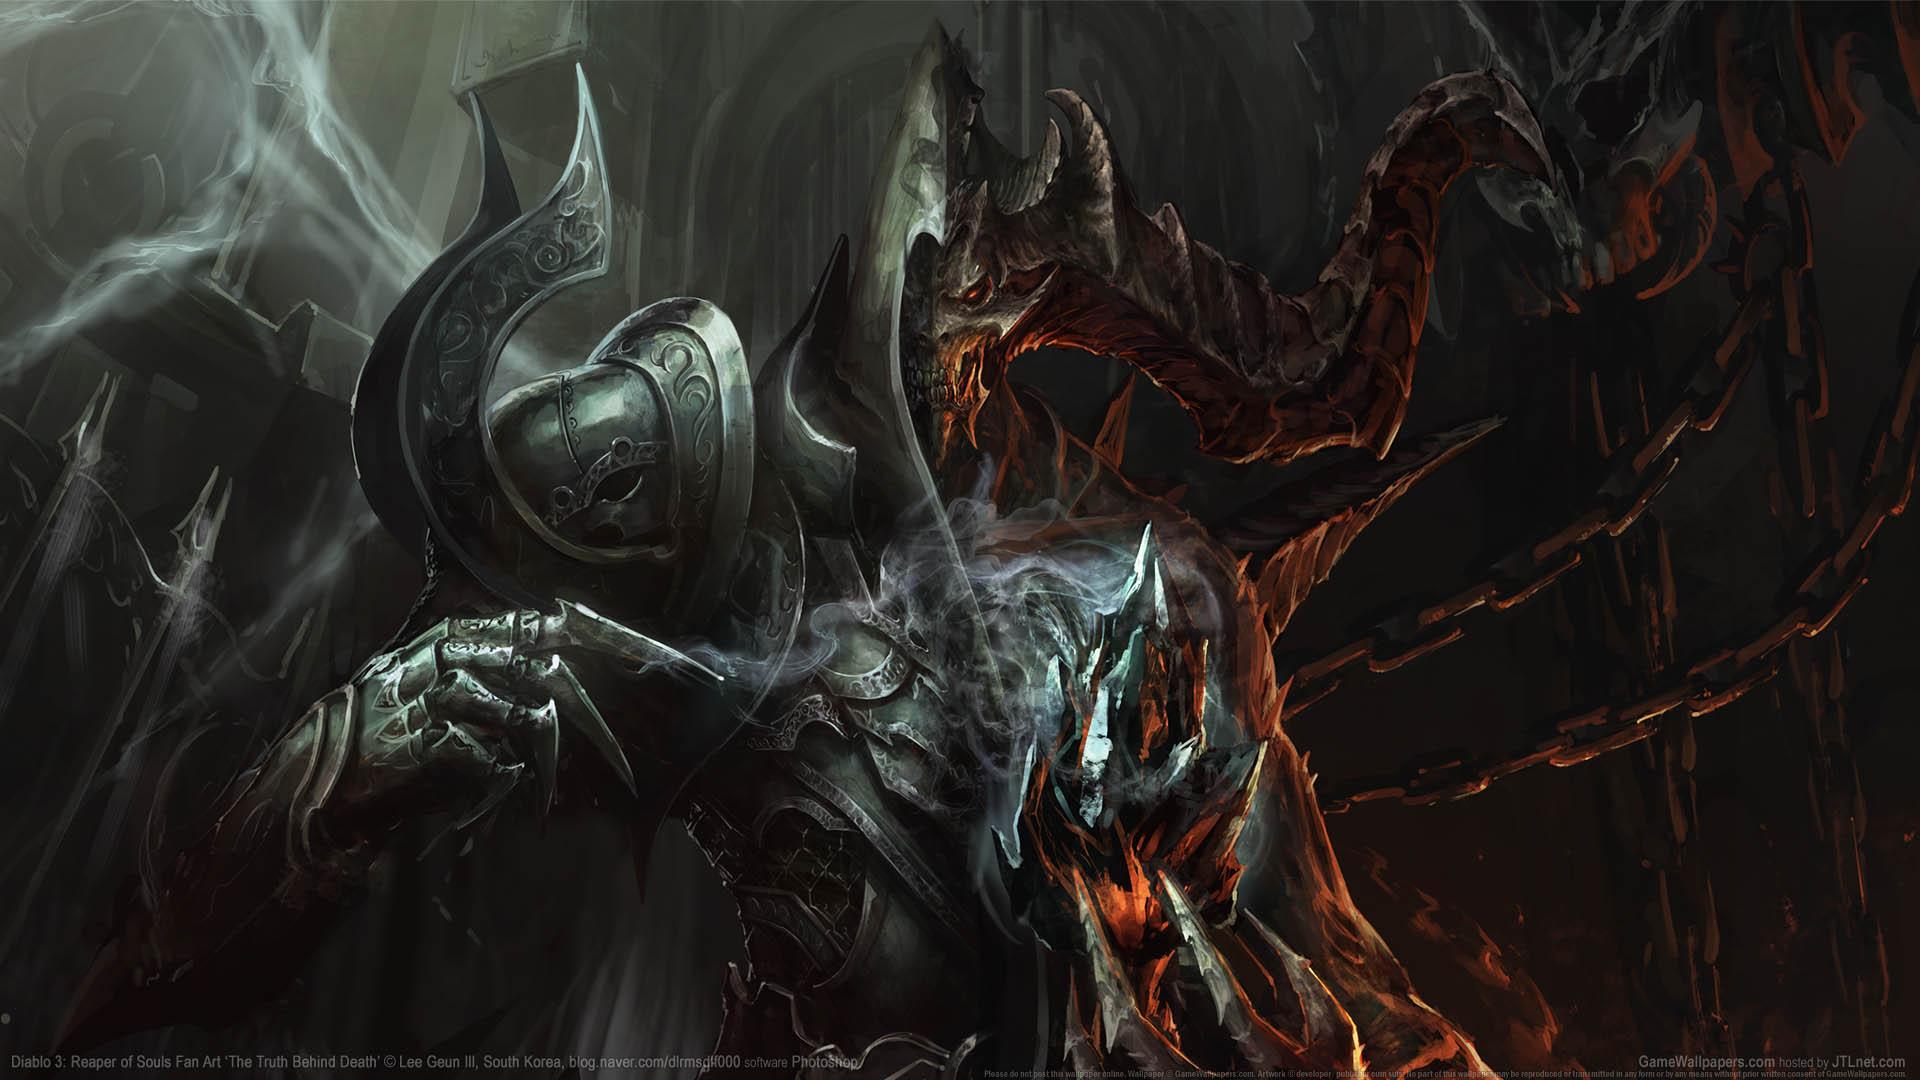 Hd Diablo 3 Wallpaper Posted By John Cunningham